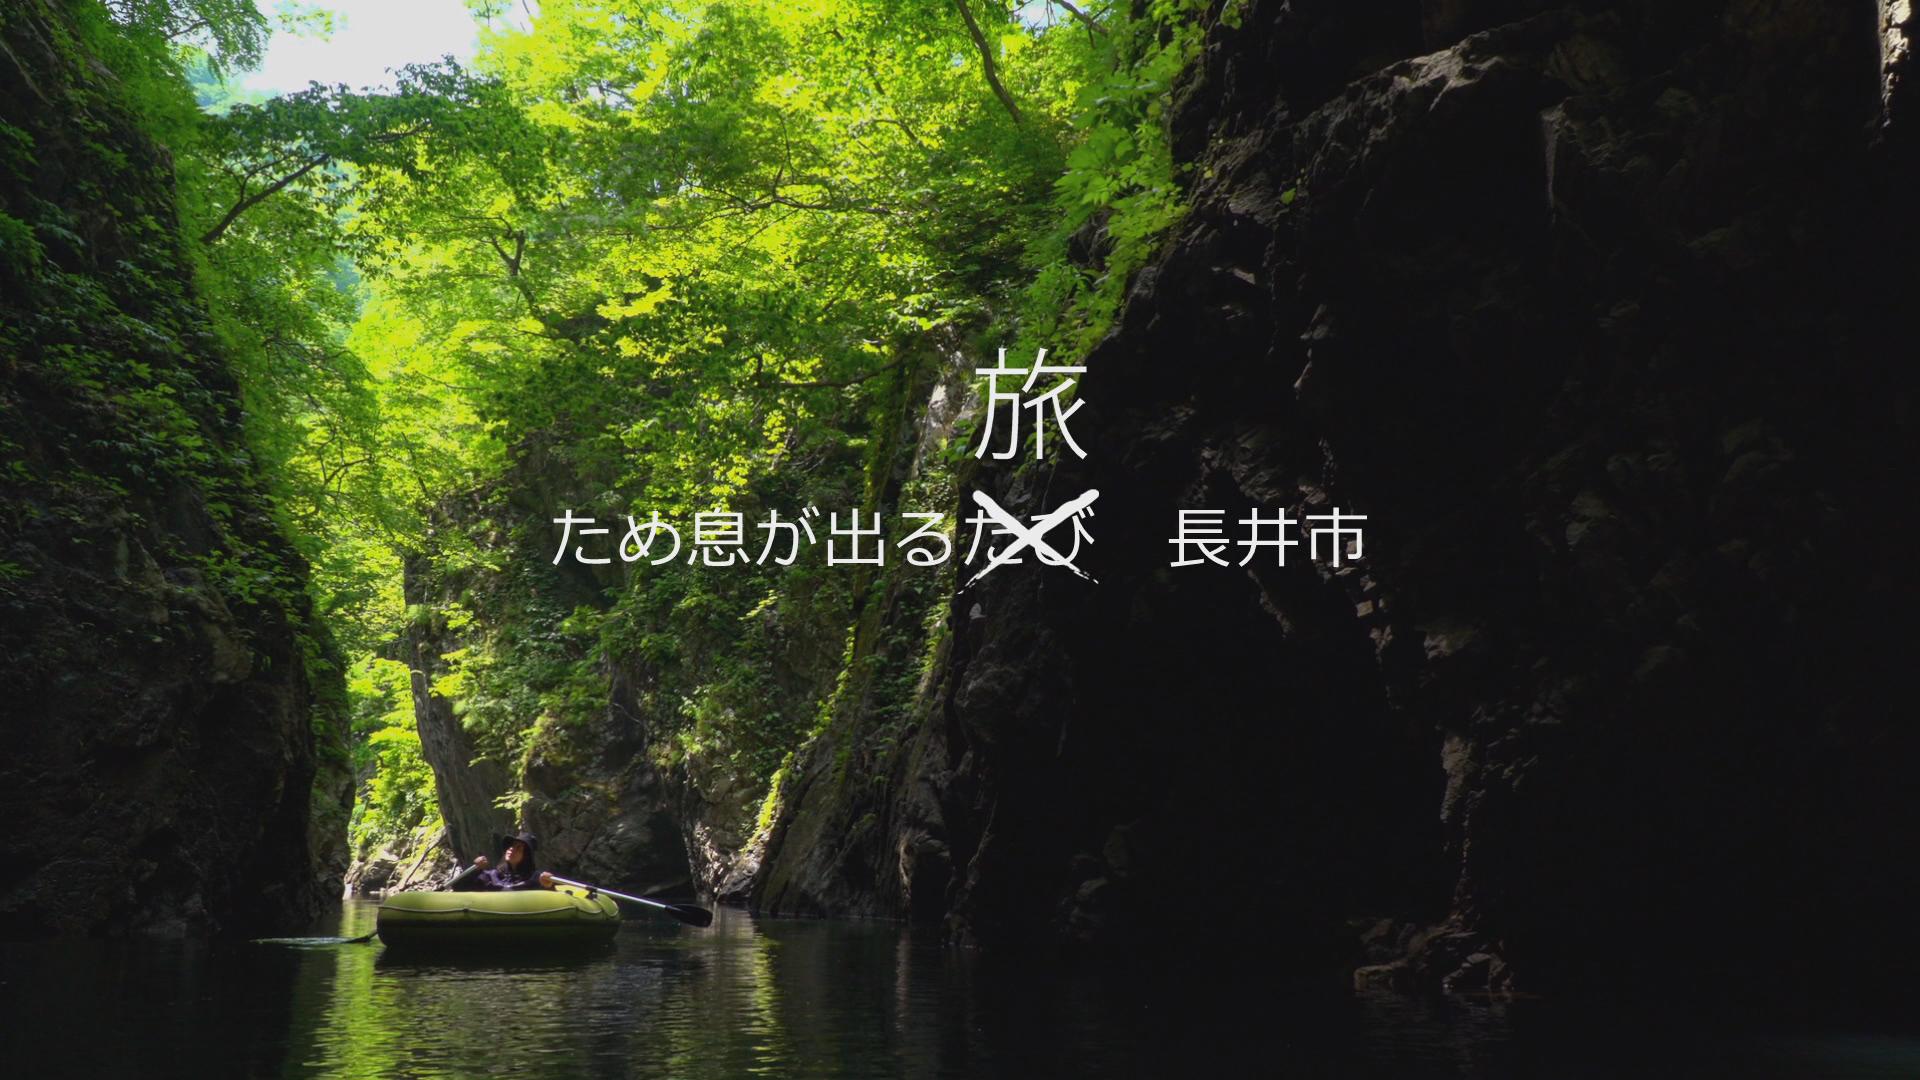 長井市の写真